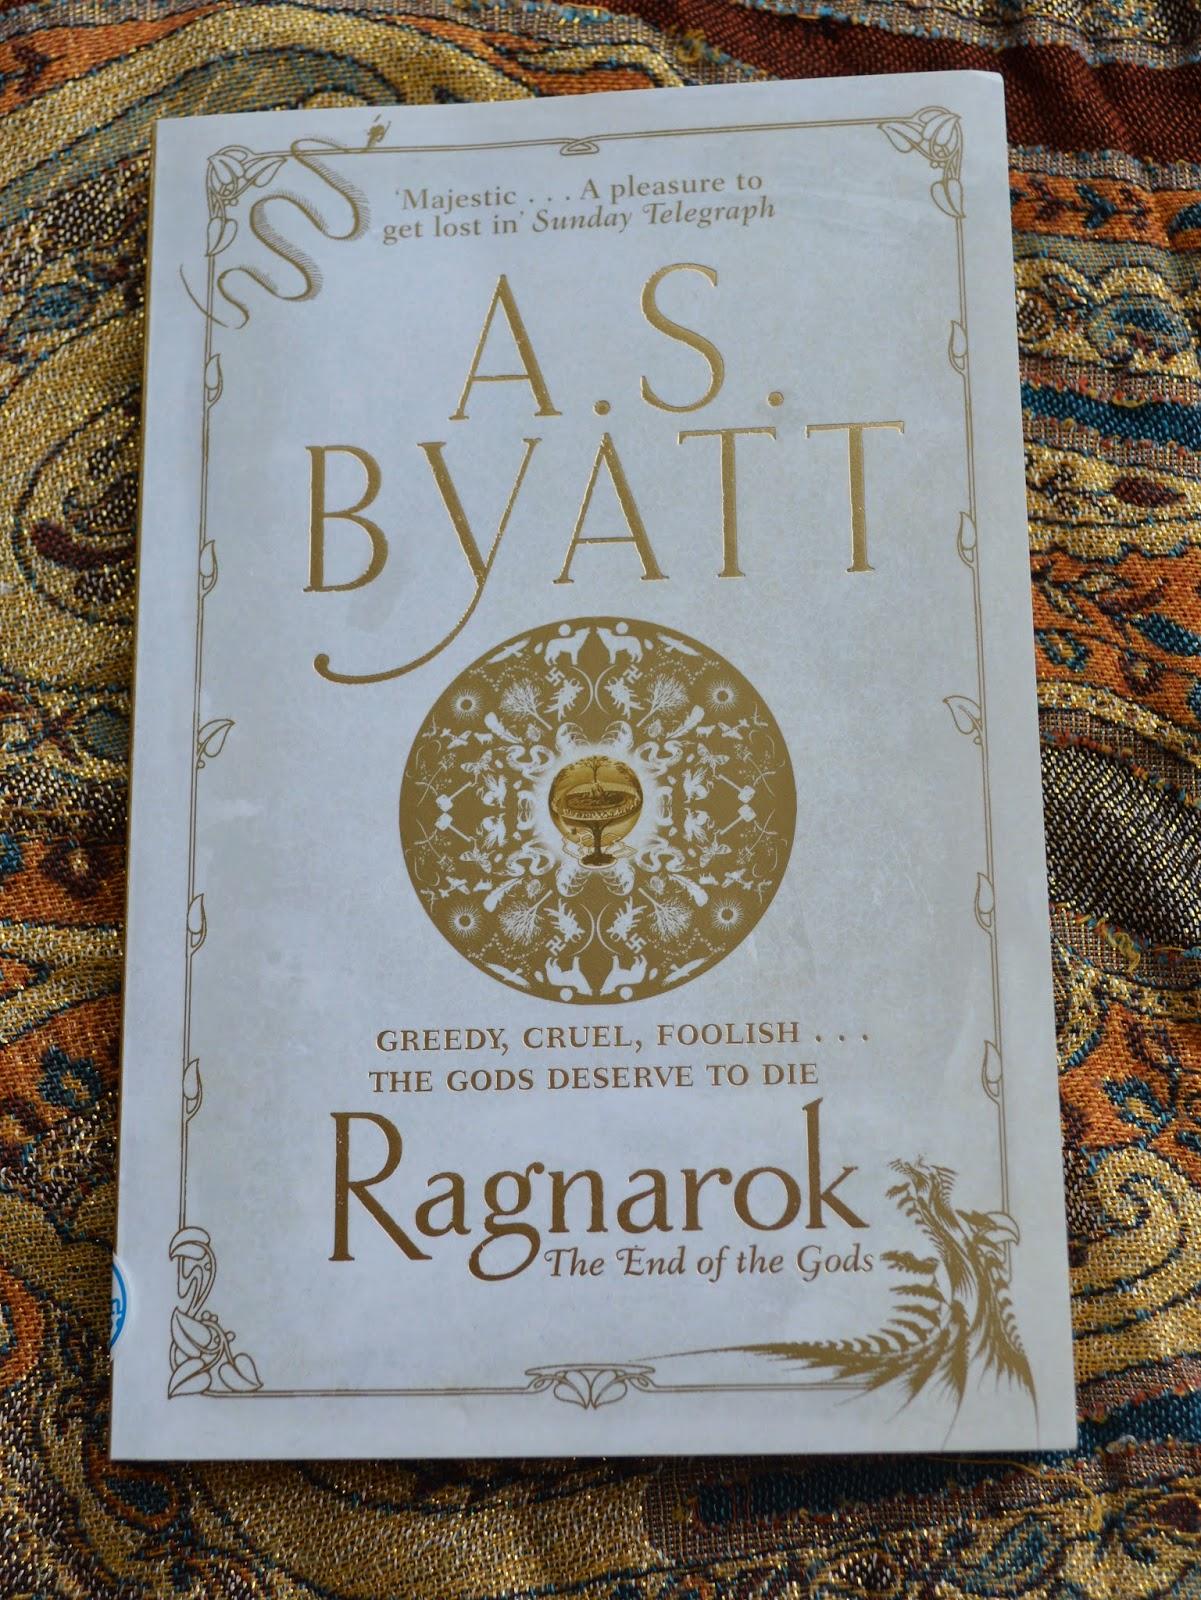 A.S Byatt, canongate, The End of the Gods, Ragnarok, Loki, Thor, Odin, battle, book review, paperback, brilliant, good read,  honest, literature, novella, myth, Norse, mythology, nordic